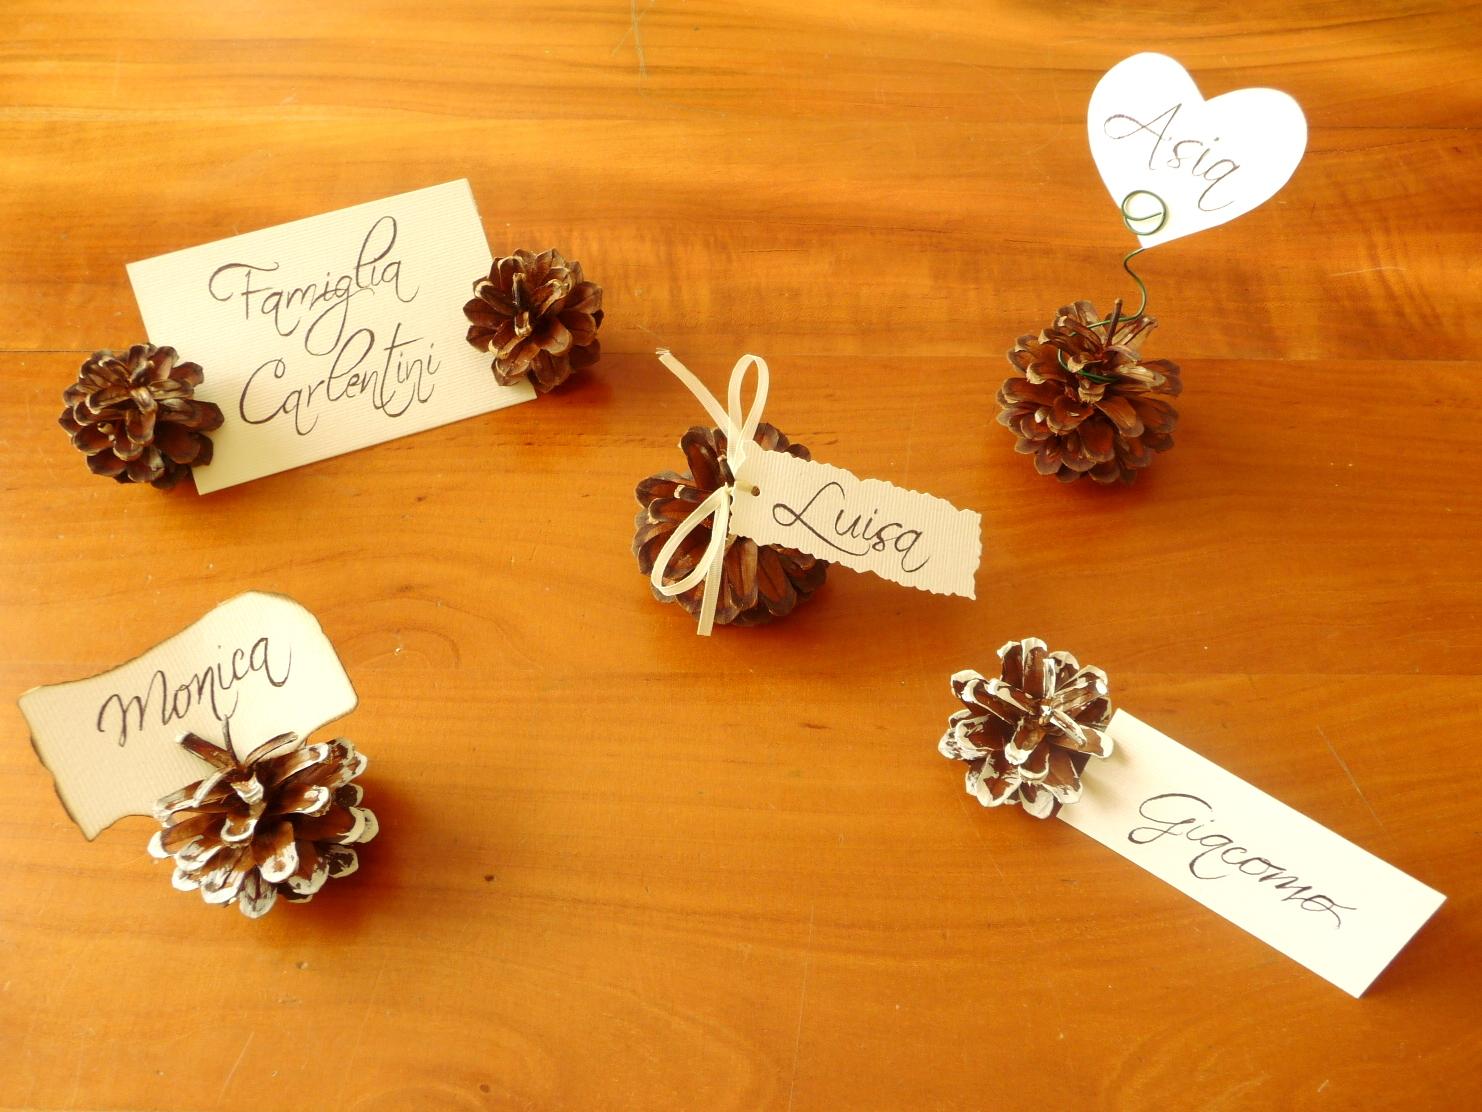 Incartesimi idee per nozzefurbe segnaposto con pigne e carta - Idee originali per segnaposto matrimonio ...